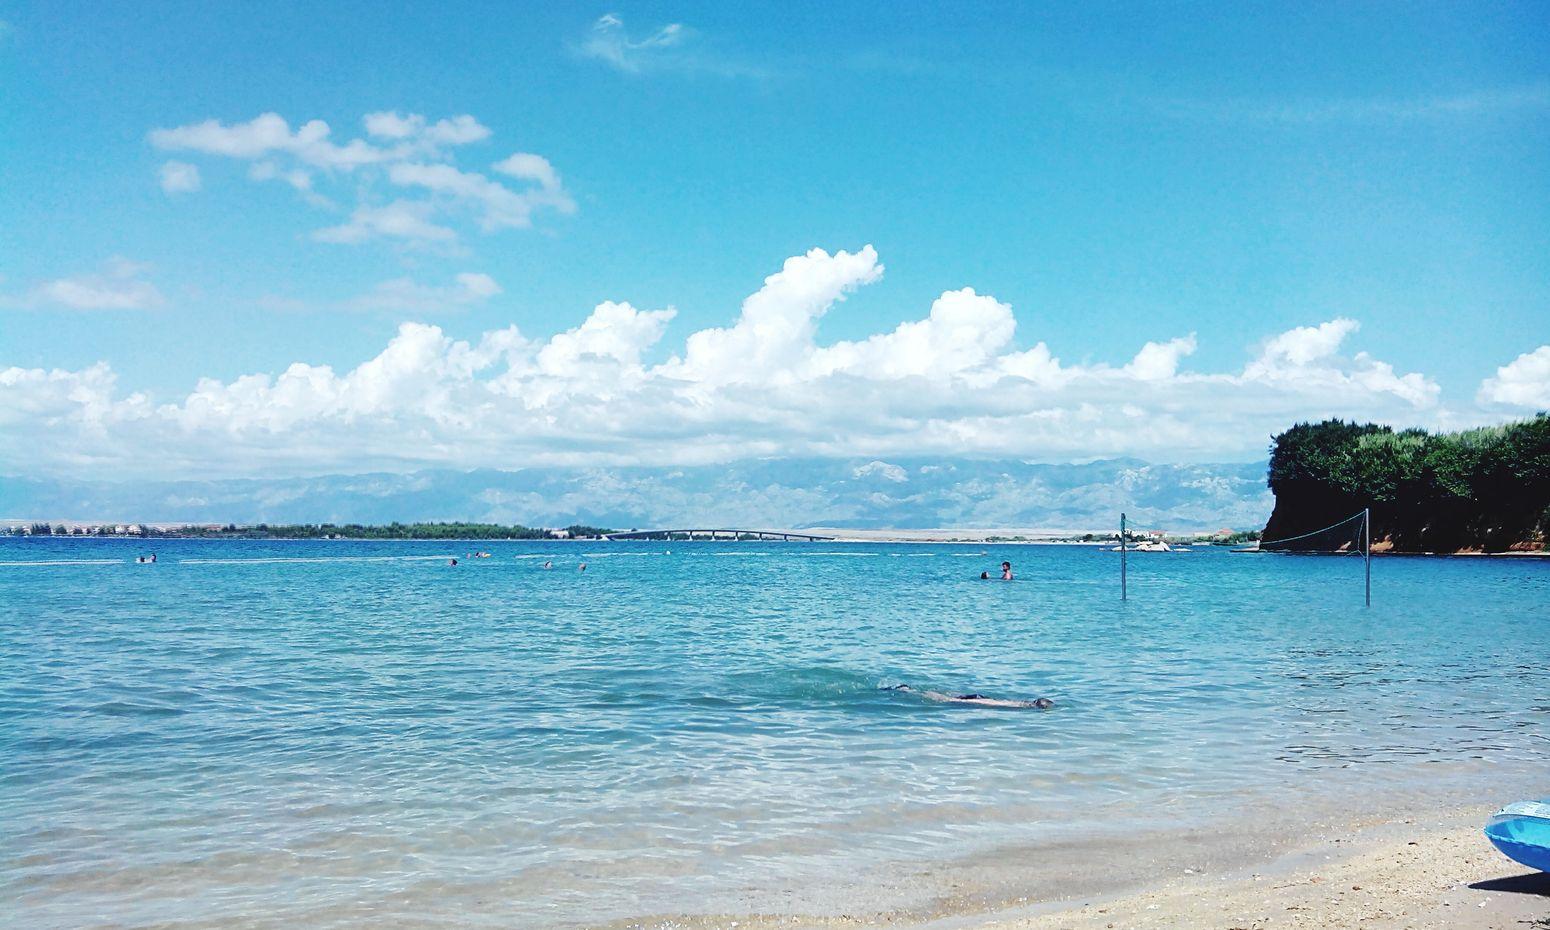 Enjoying The Sun Relaxing Beach Croatia ♡ Sea Swimming Getting A Tan Sea And Sky Sunlight Cristal Clear